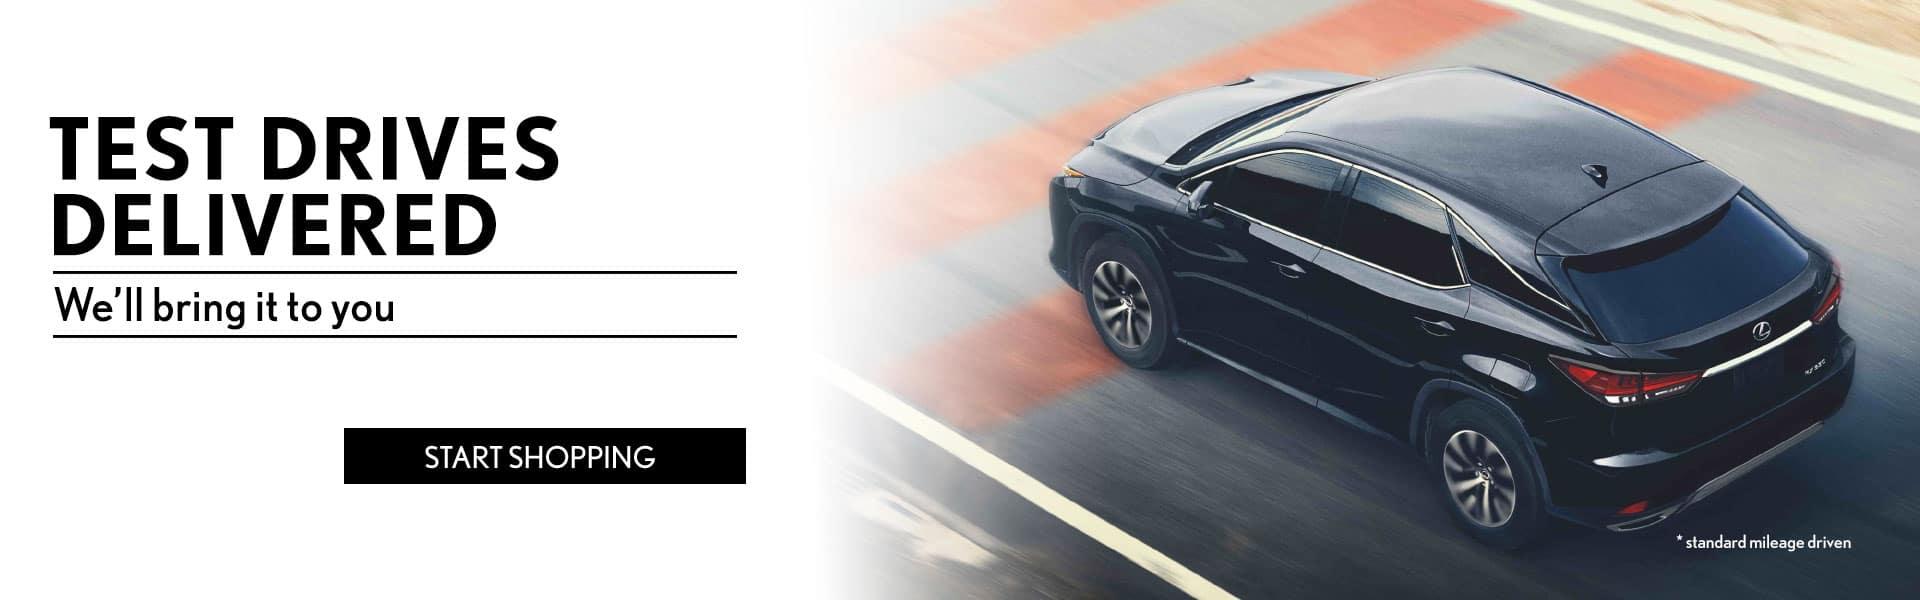 Lexus Test Drive in Eugene